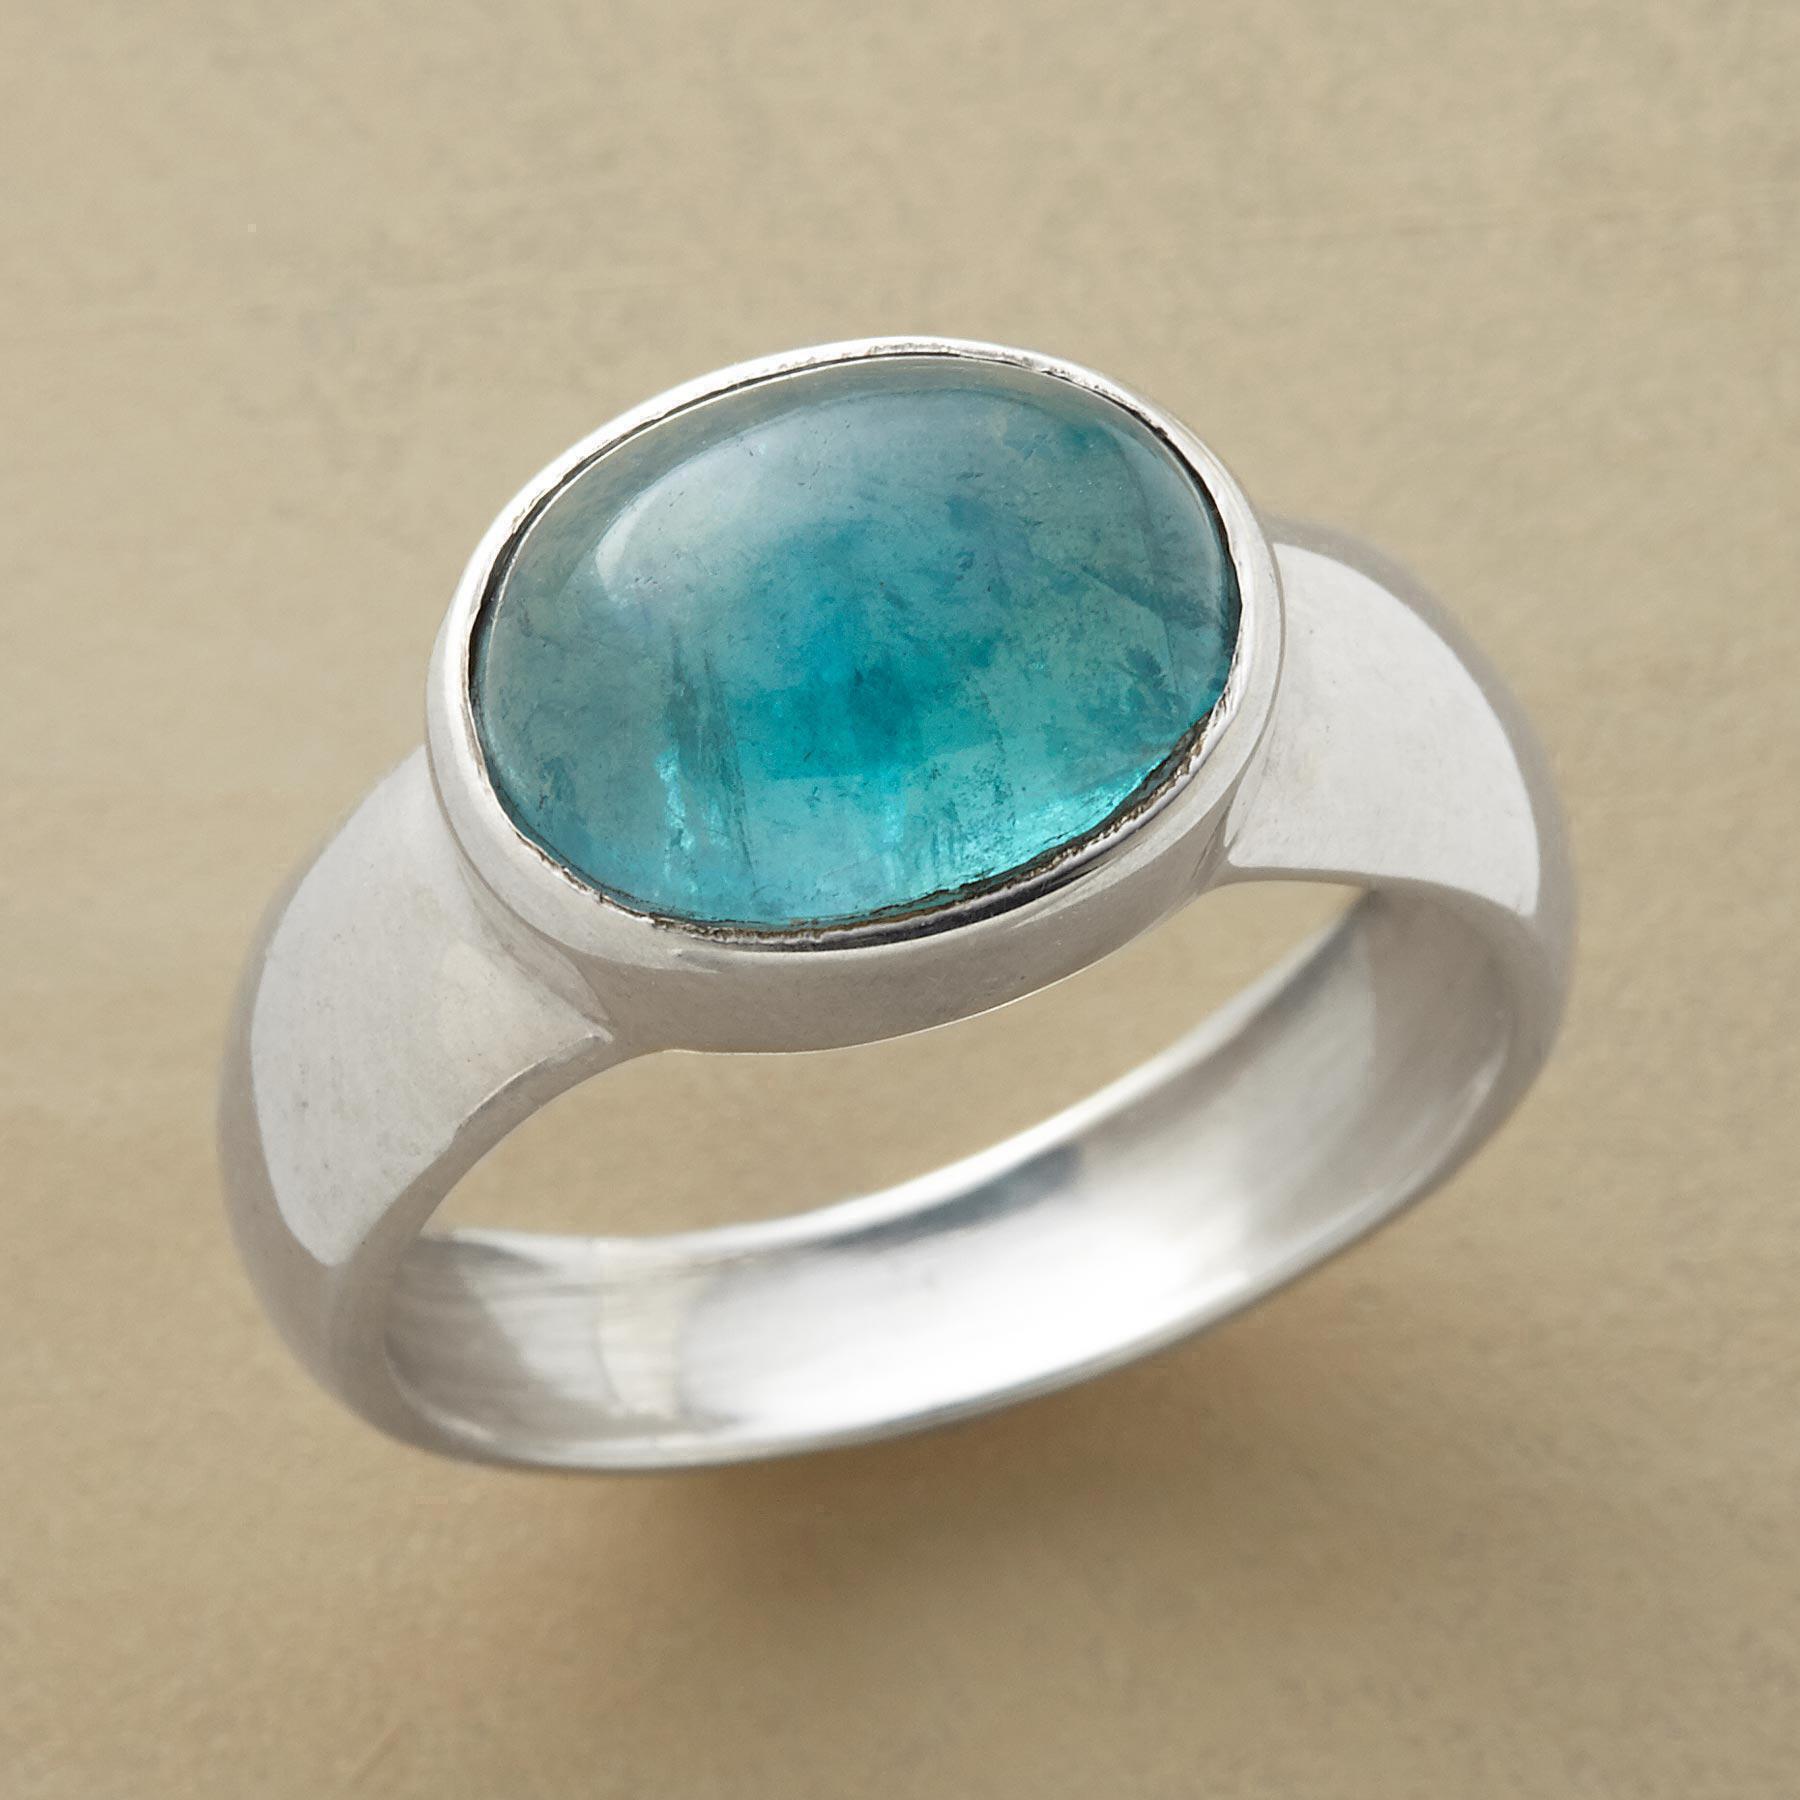 BLUE BEYOND RING: View 1